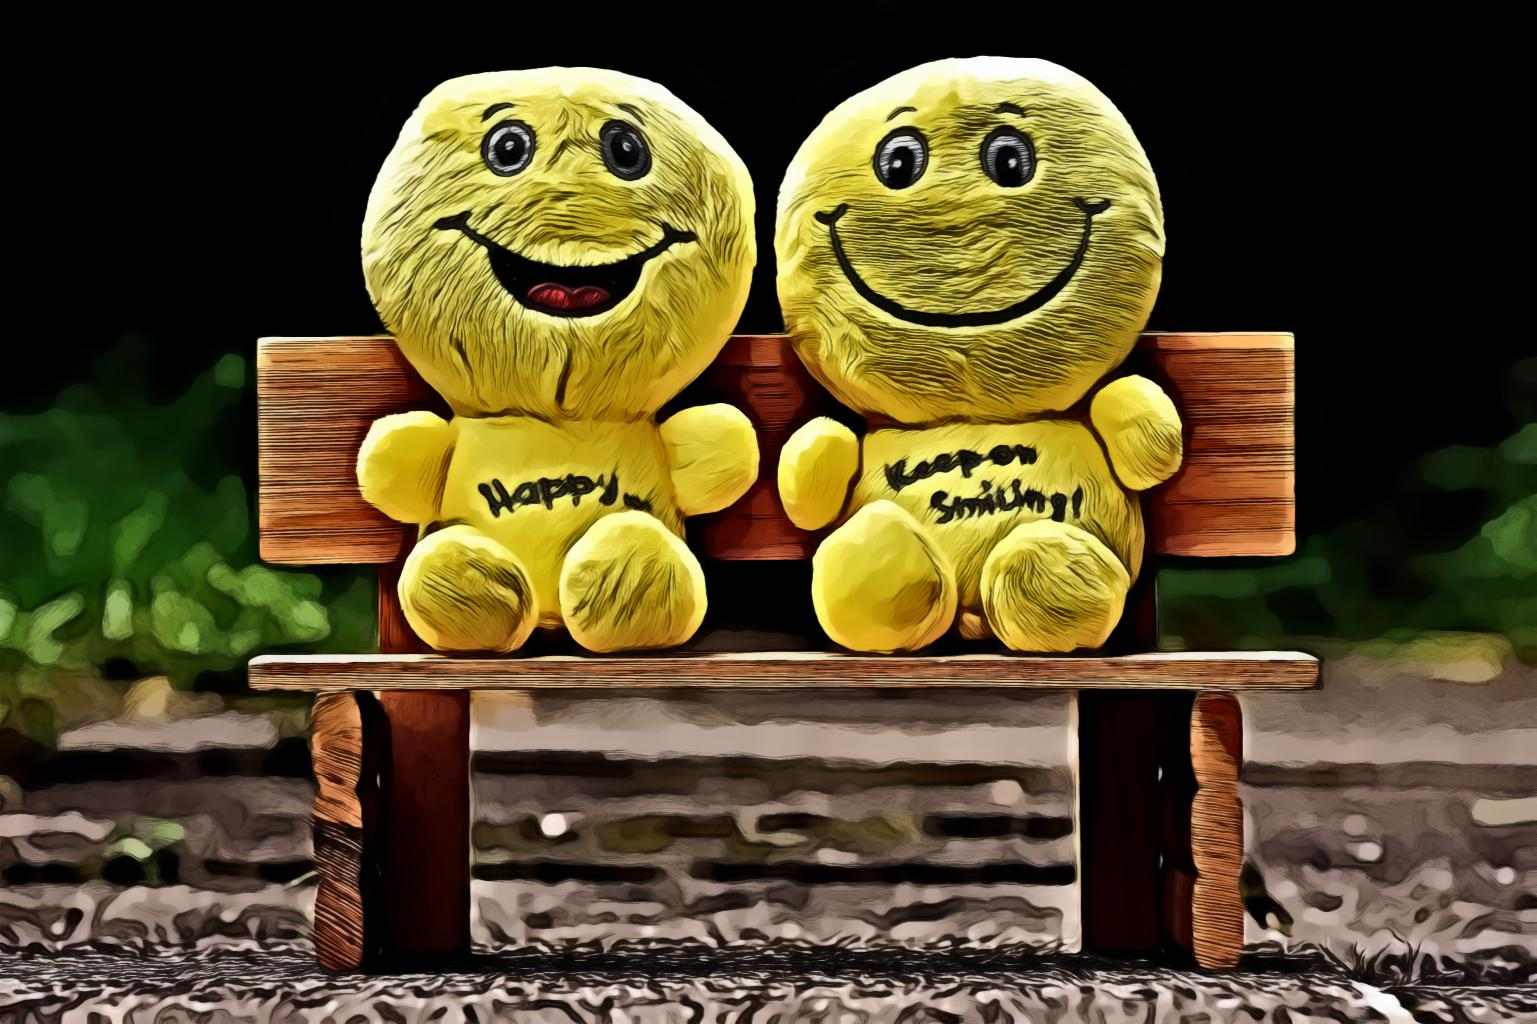 Two Yellow Plush Toys Sitting On Bench